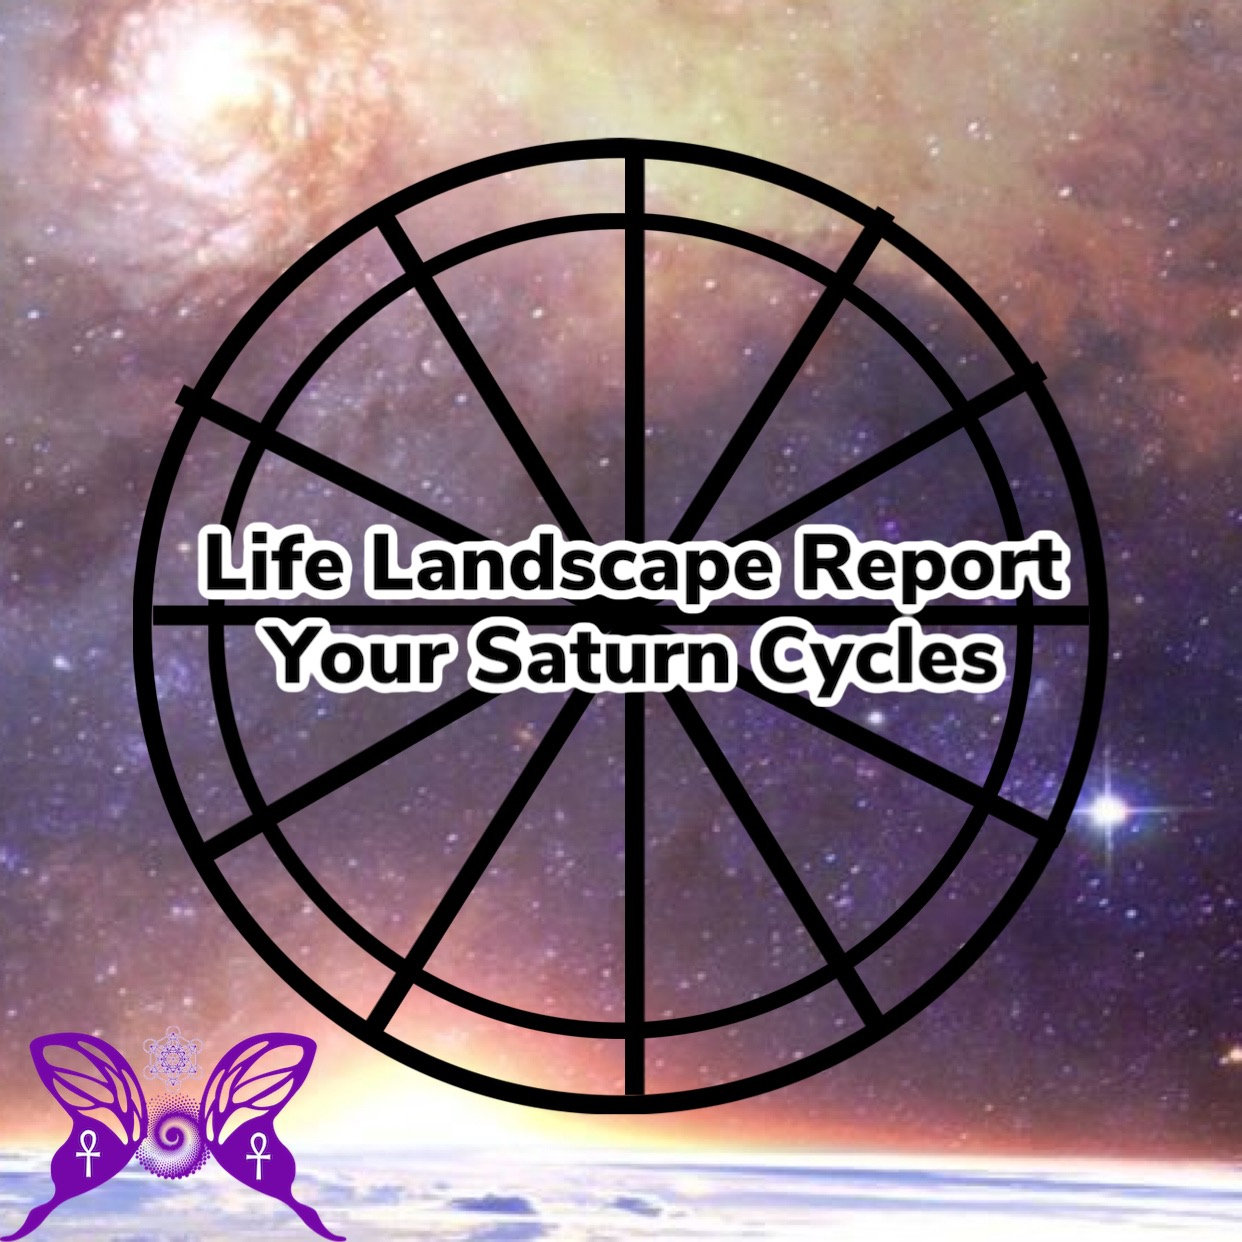 Life Landscape Report